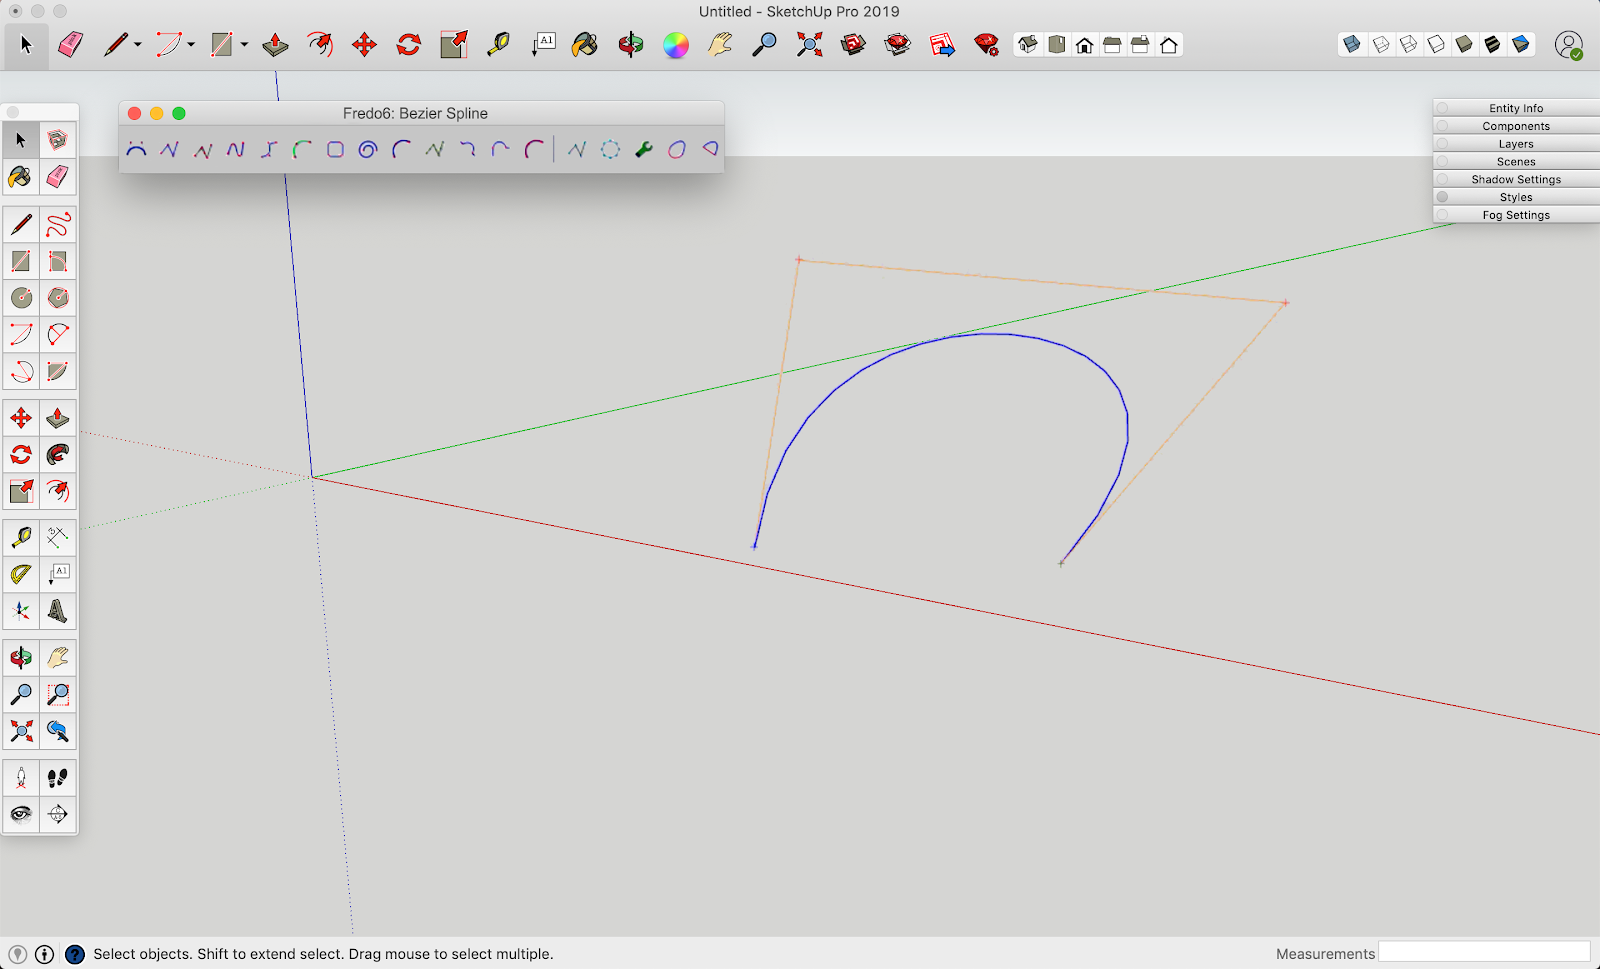 Fredo6: Bezier Spline UI in SketchUp